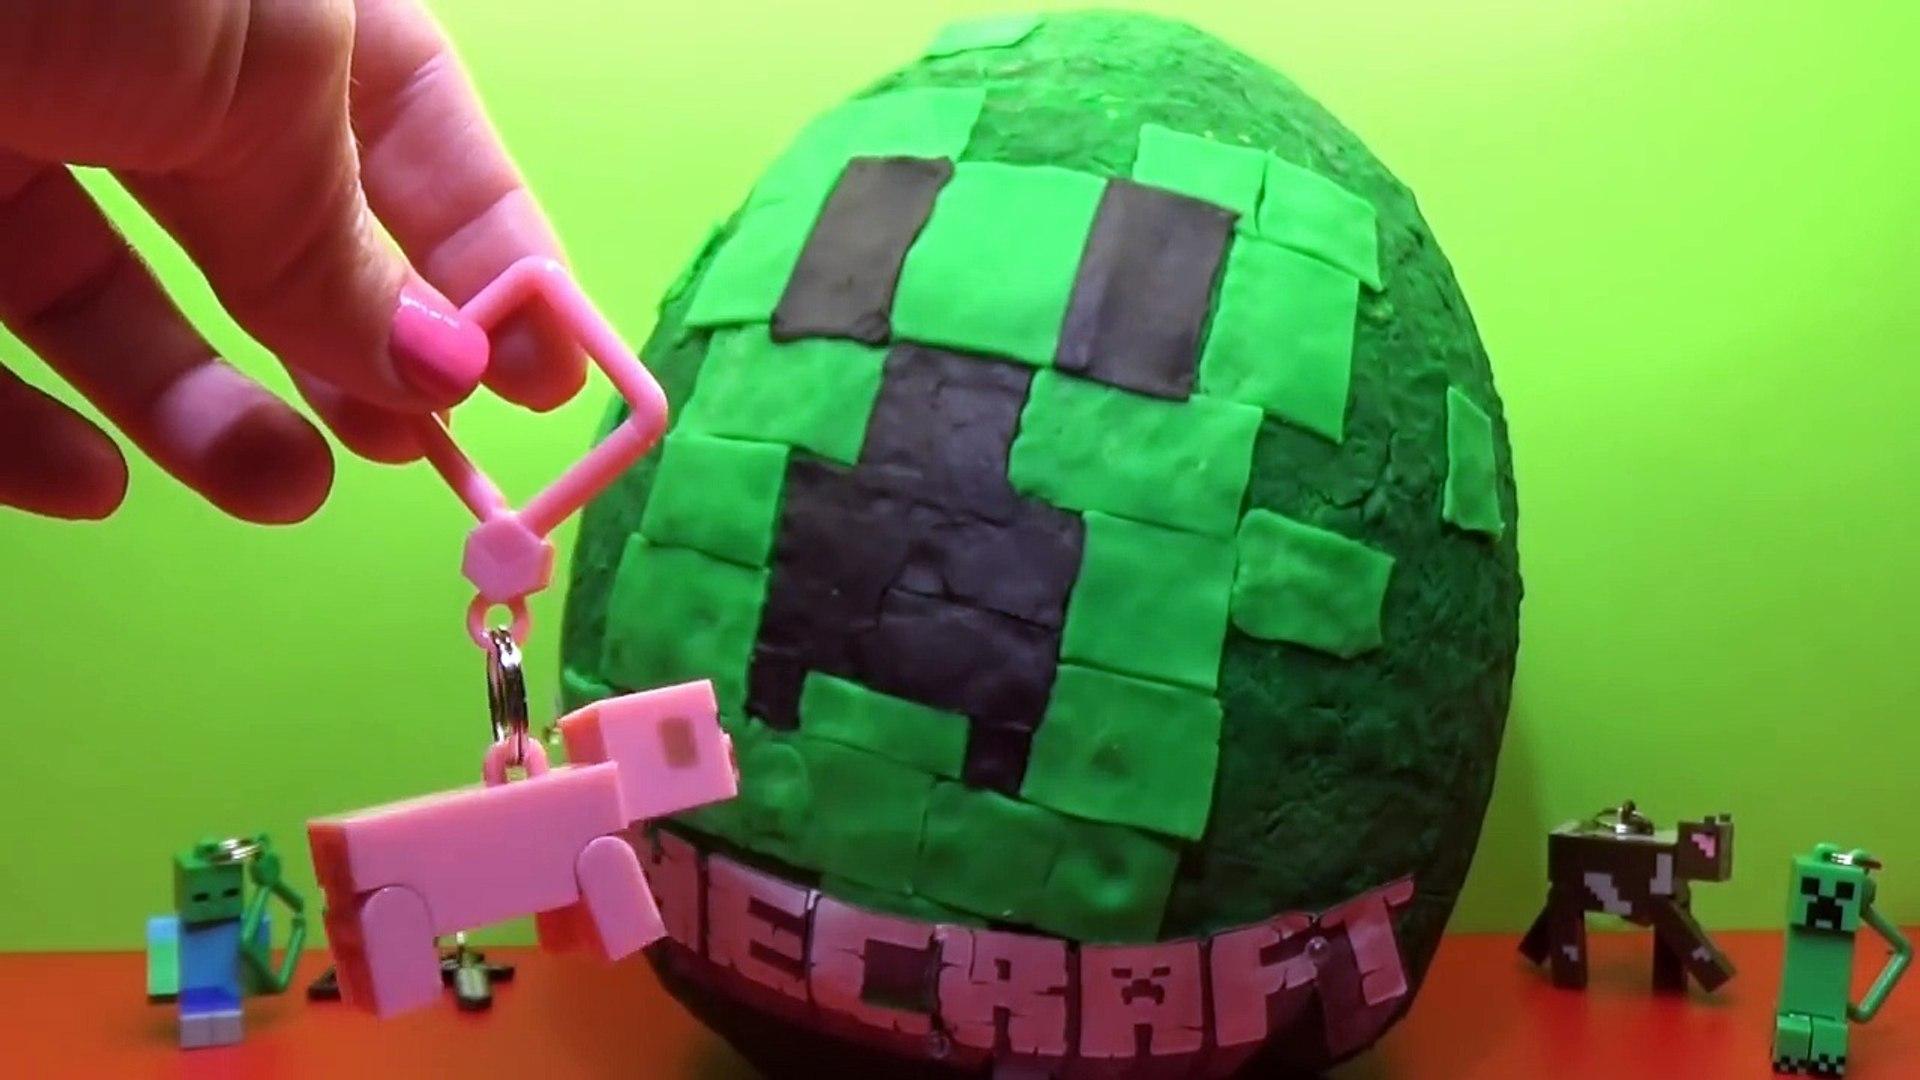 Minecraft gigante juguetes huevo sorpresa Keychaine Minecraft géant jouets surprise, dœufs